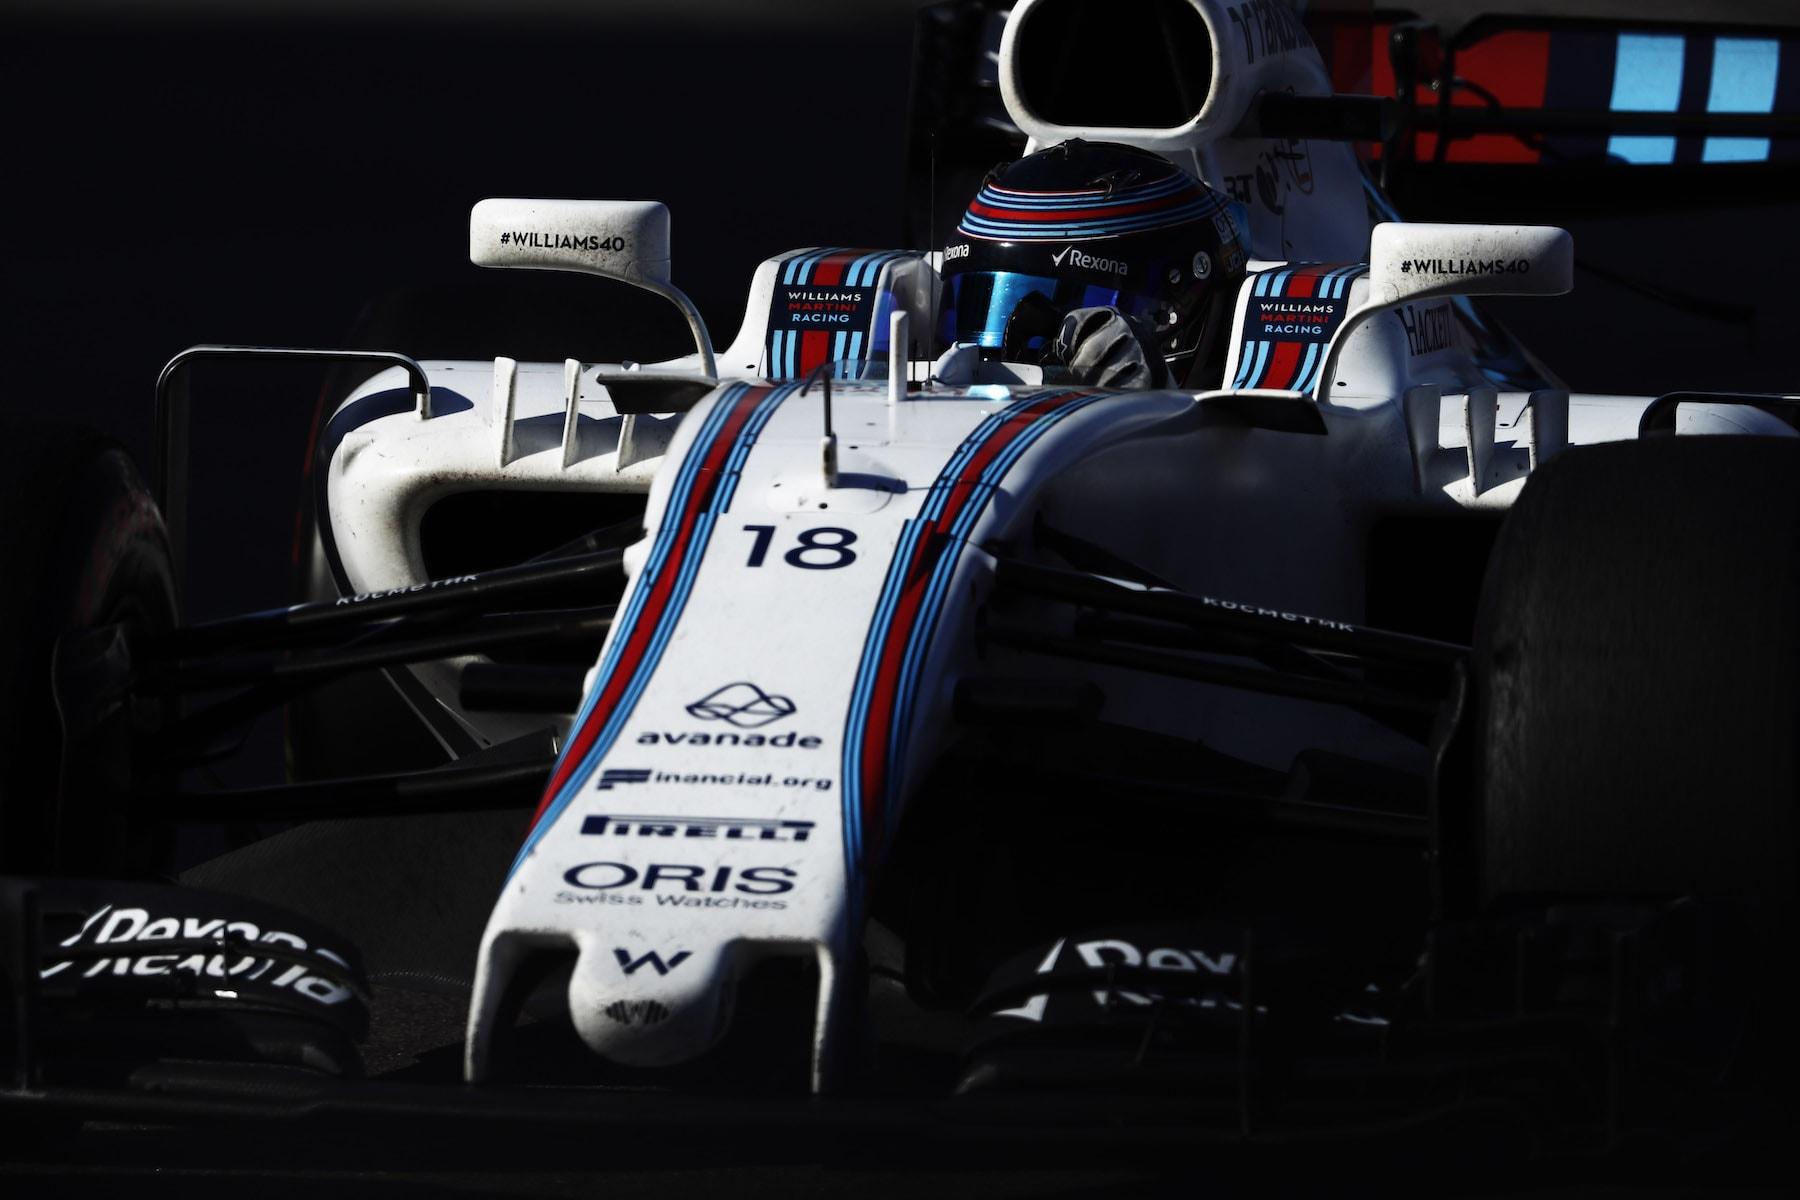 G 2017 Lance Stroll | Williams FW40 | 2017 Russian GP P 1 copy.jpg